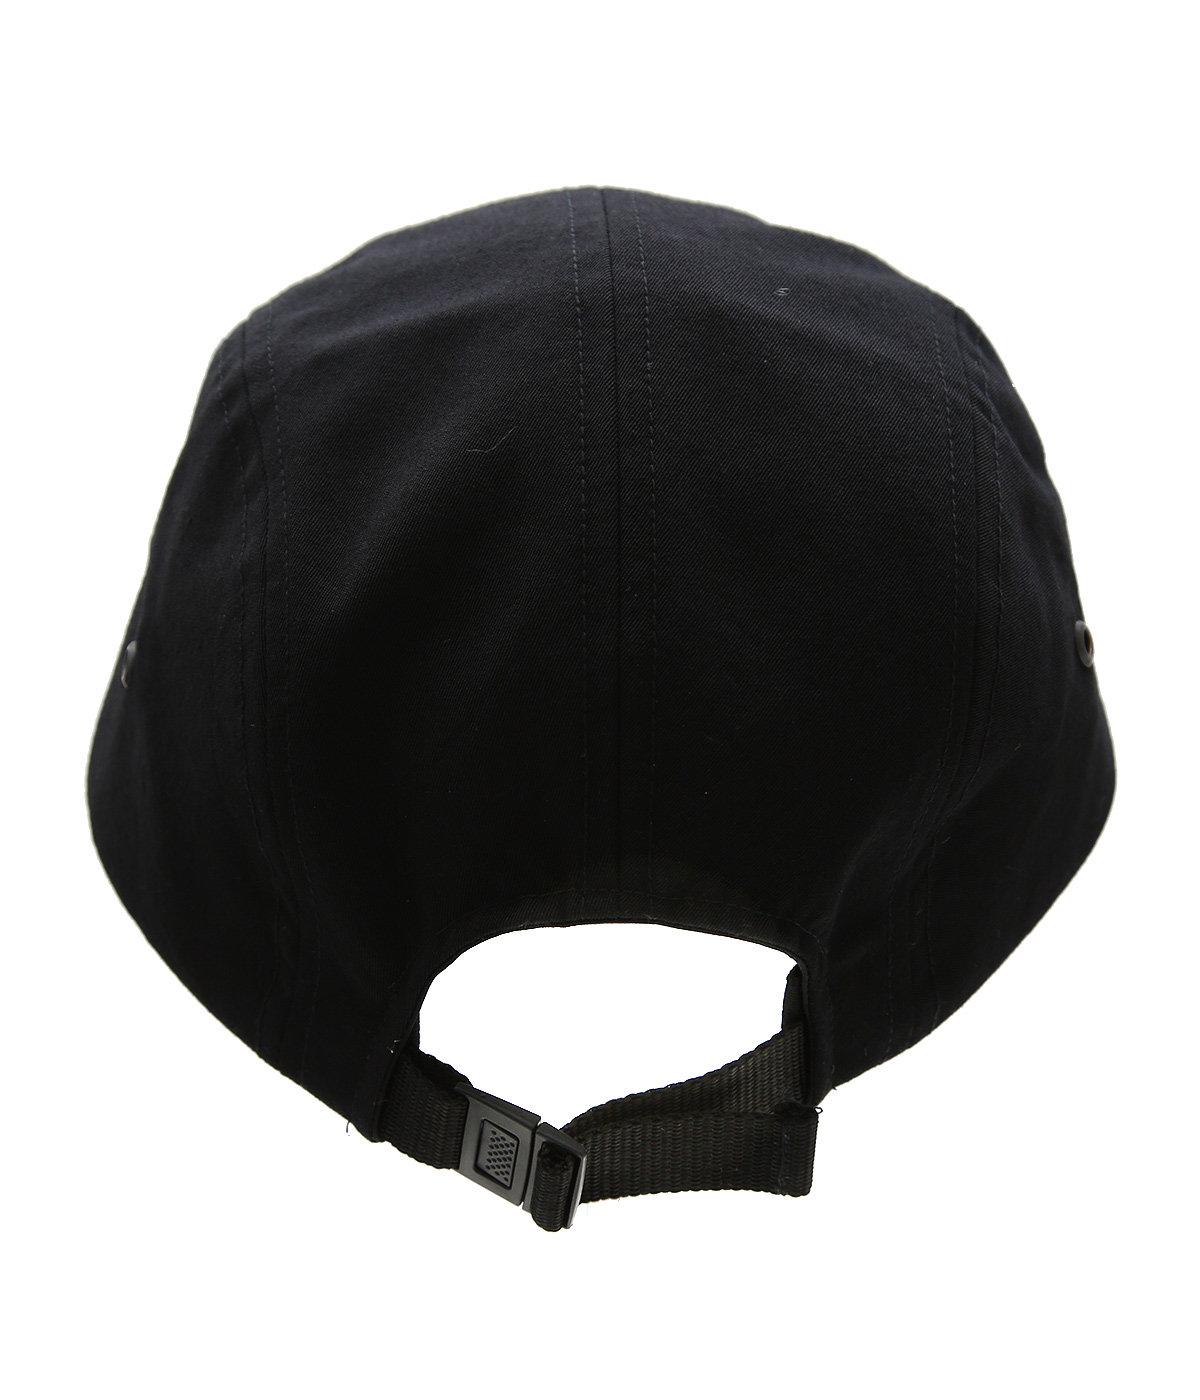 LONG BRIM JET CAP